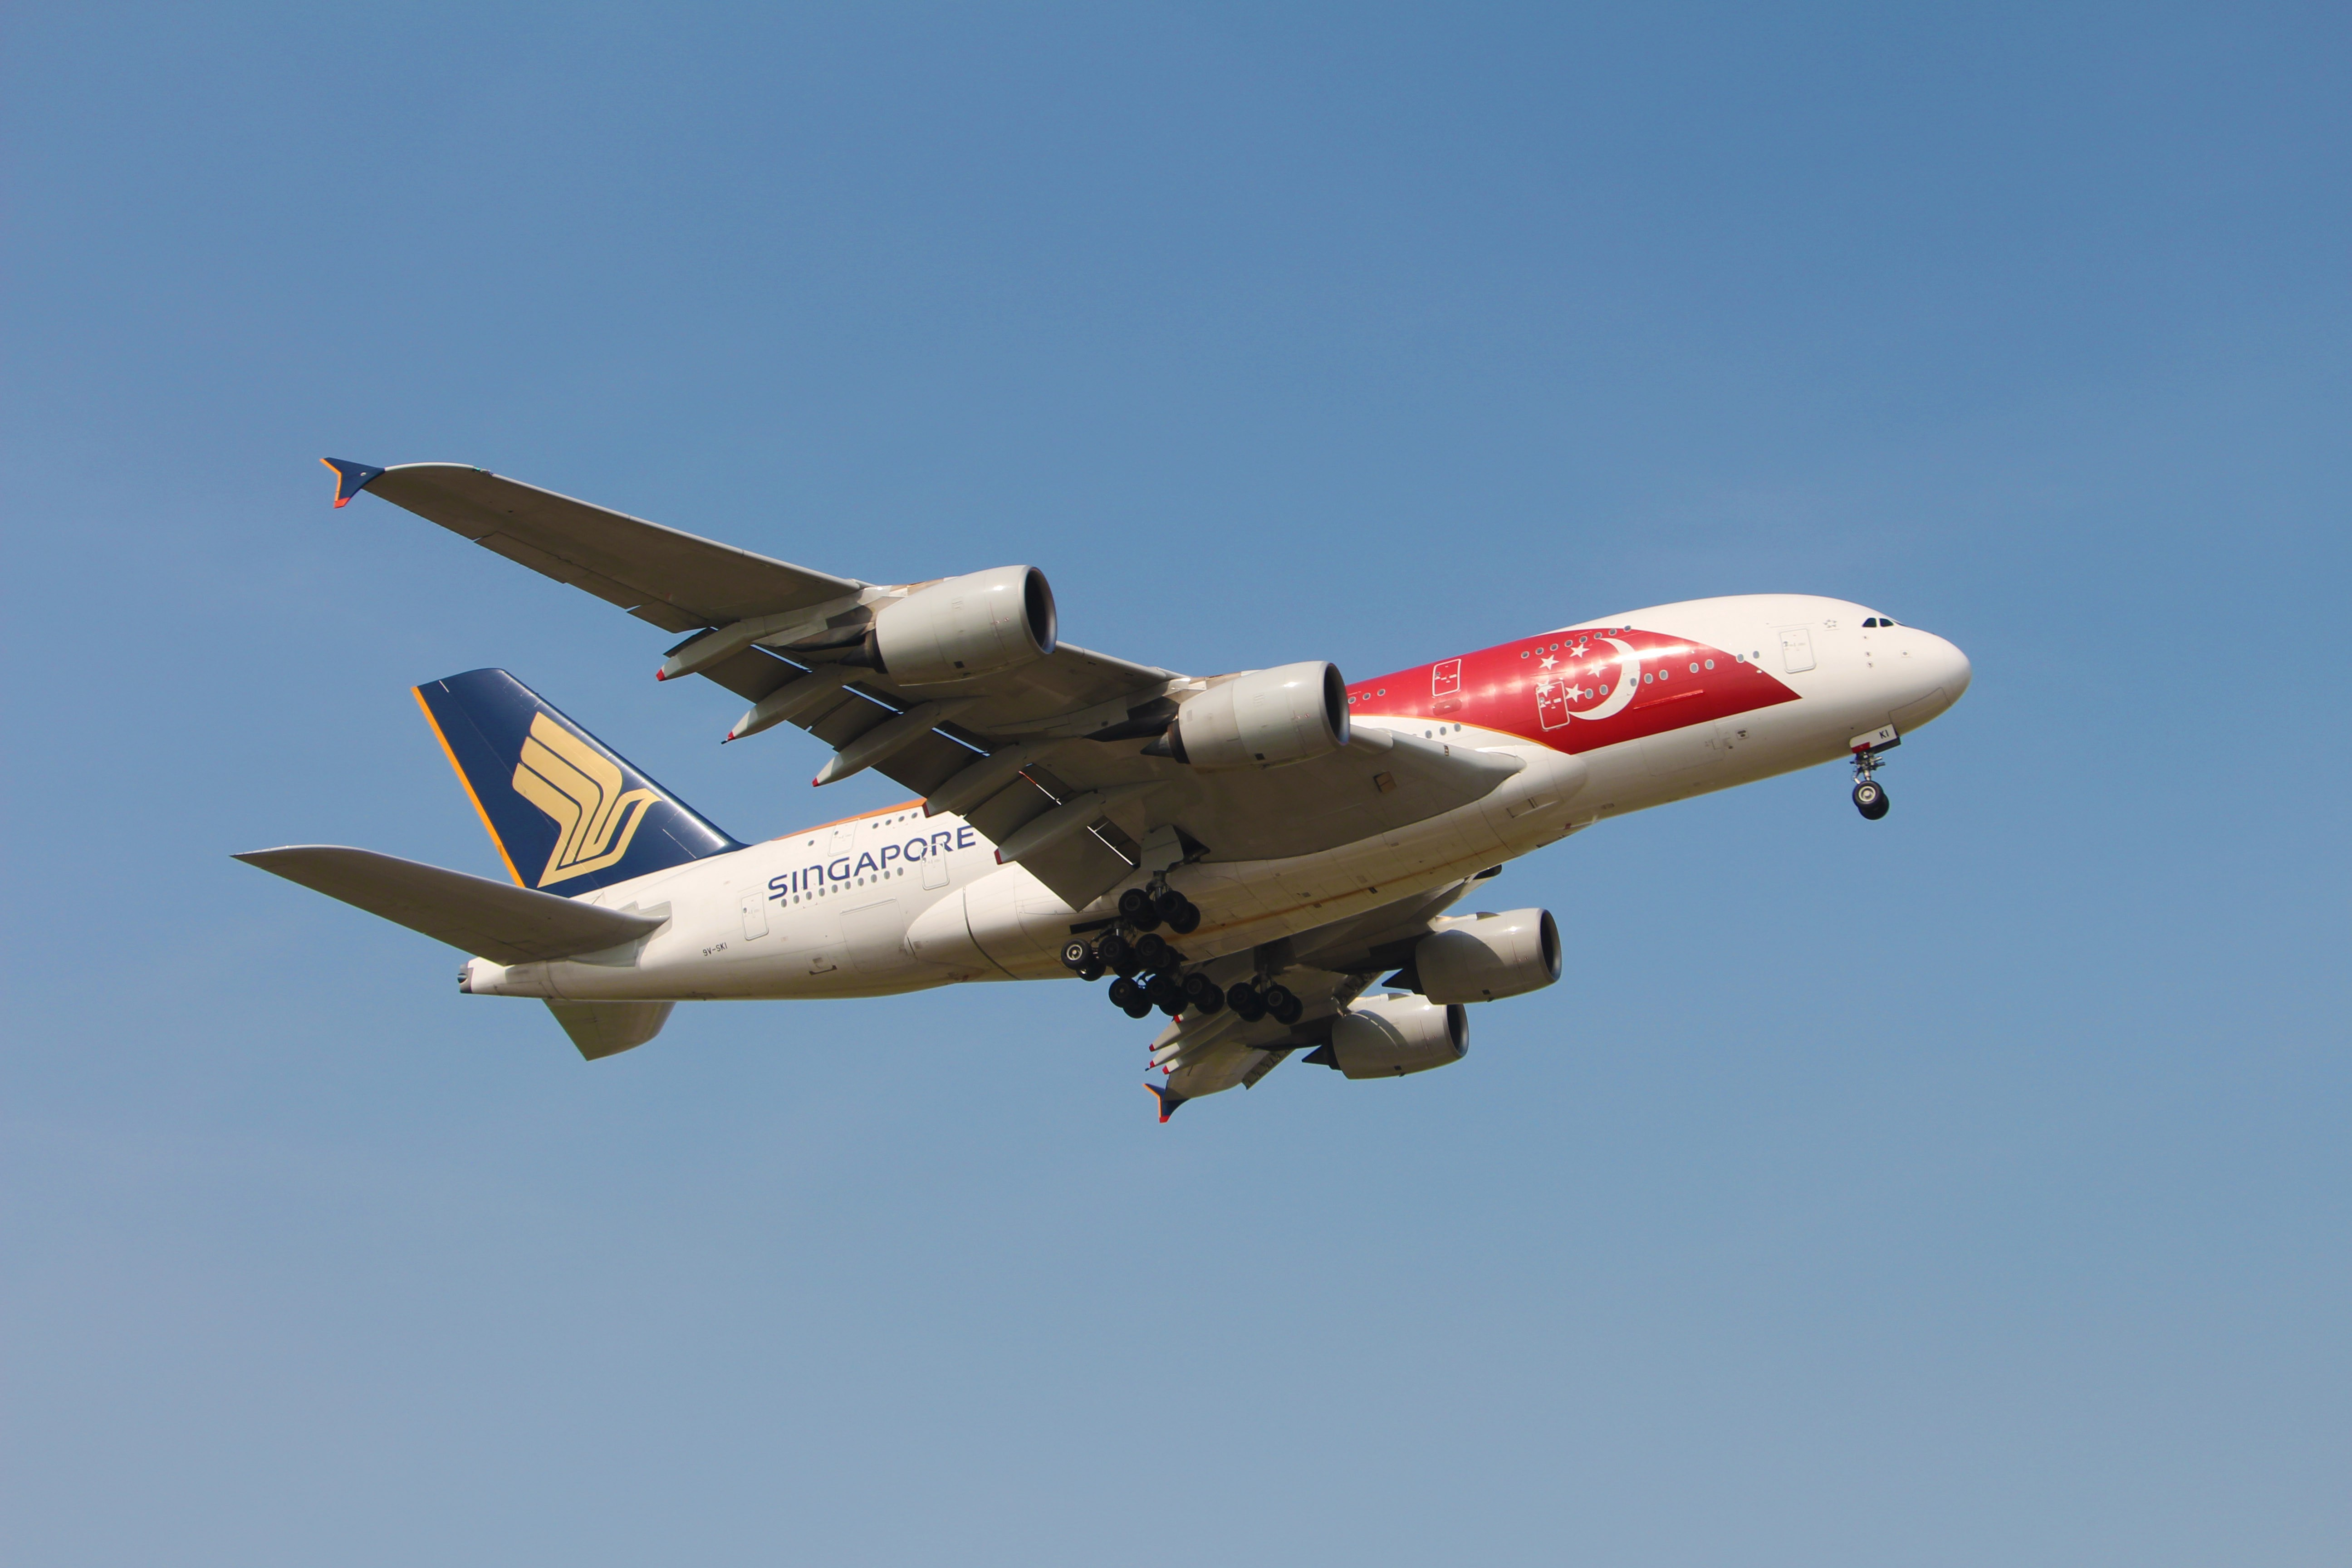 Re:[原创]浦东拍机大作战 AIRBUS A380-800 9V-SKI 中国上海浦东国际机场